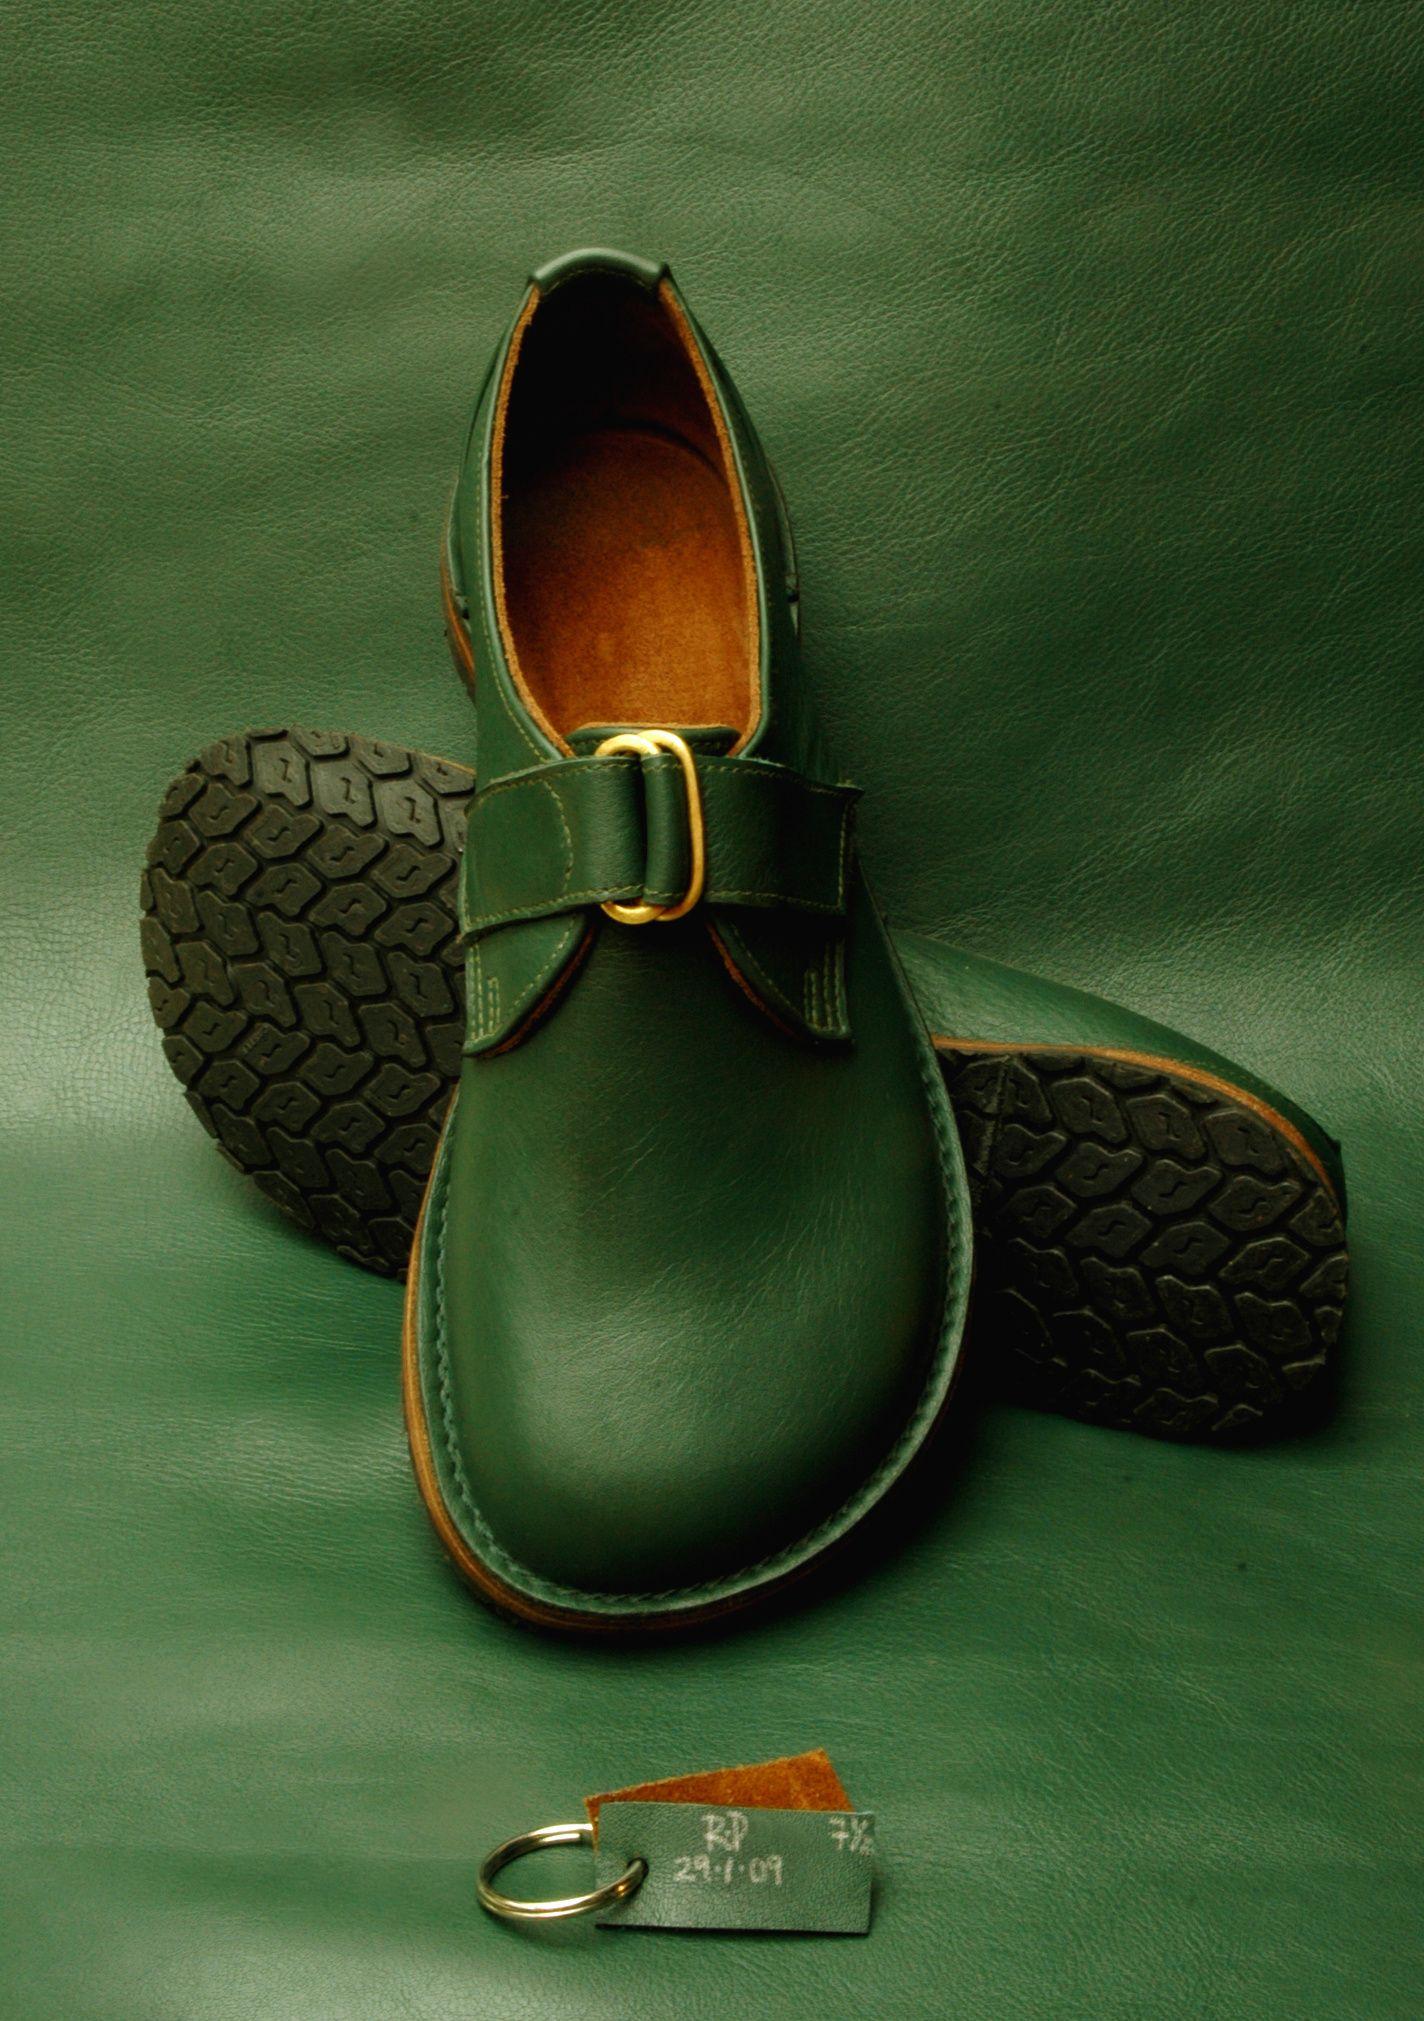 Ruth Emily Davey scarpe   Oh My My Oh scarpe   Pinterest   Scarpe, Sandalo   4e4253